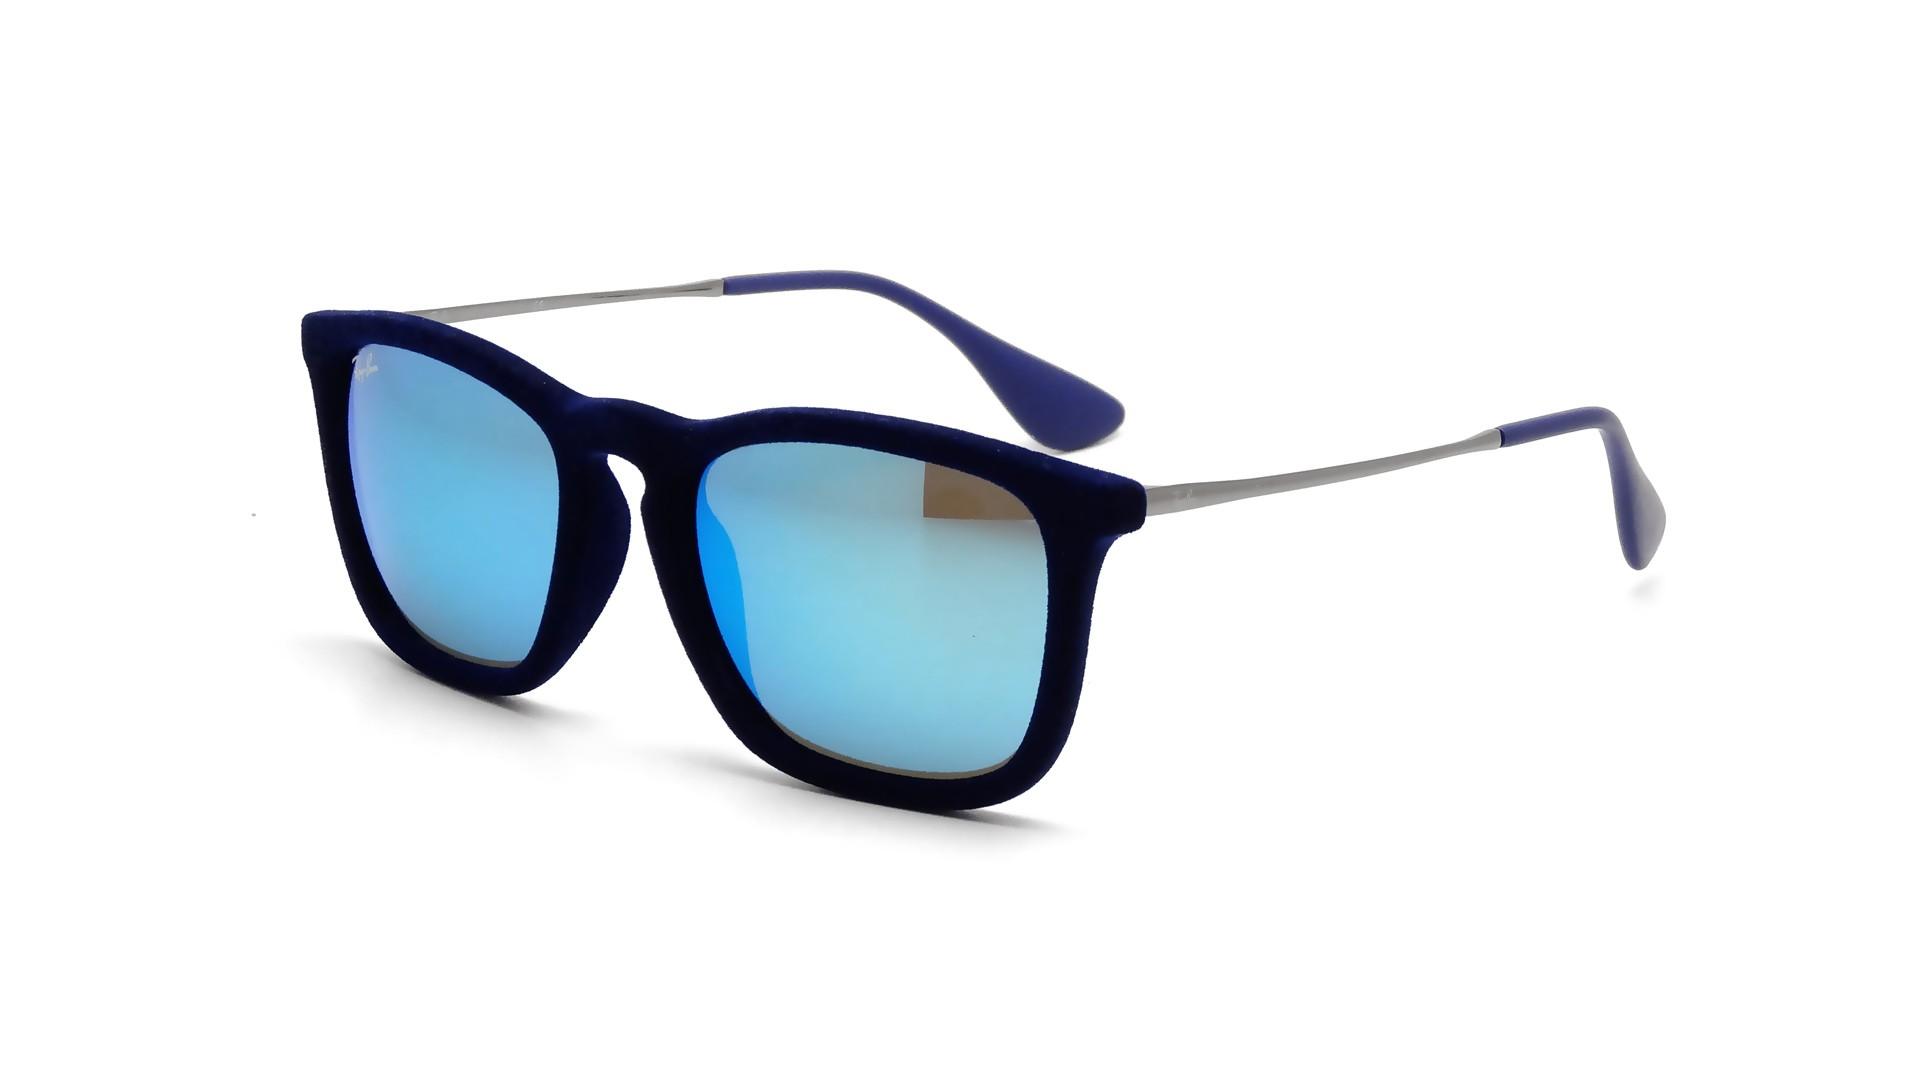 Lunettes de soleil Ray-Ban Chris Velvet Edition Blau RB4187 6081 55 54-18  Medium Mirrored 7b43f2c61253